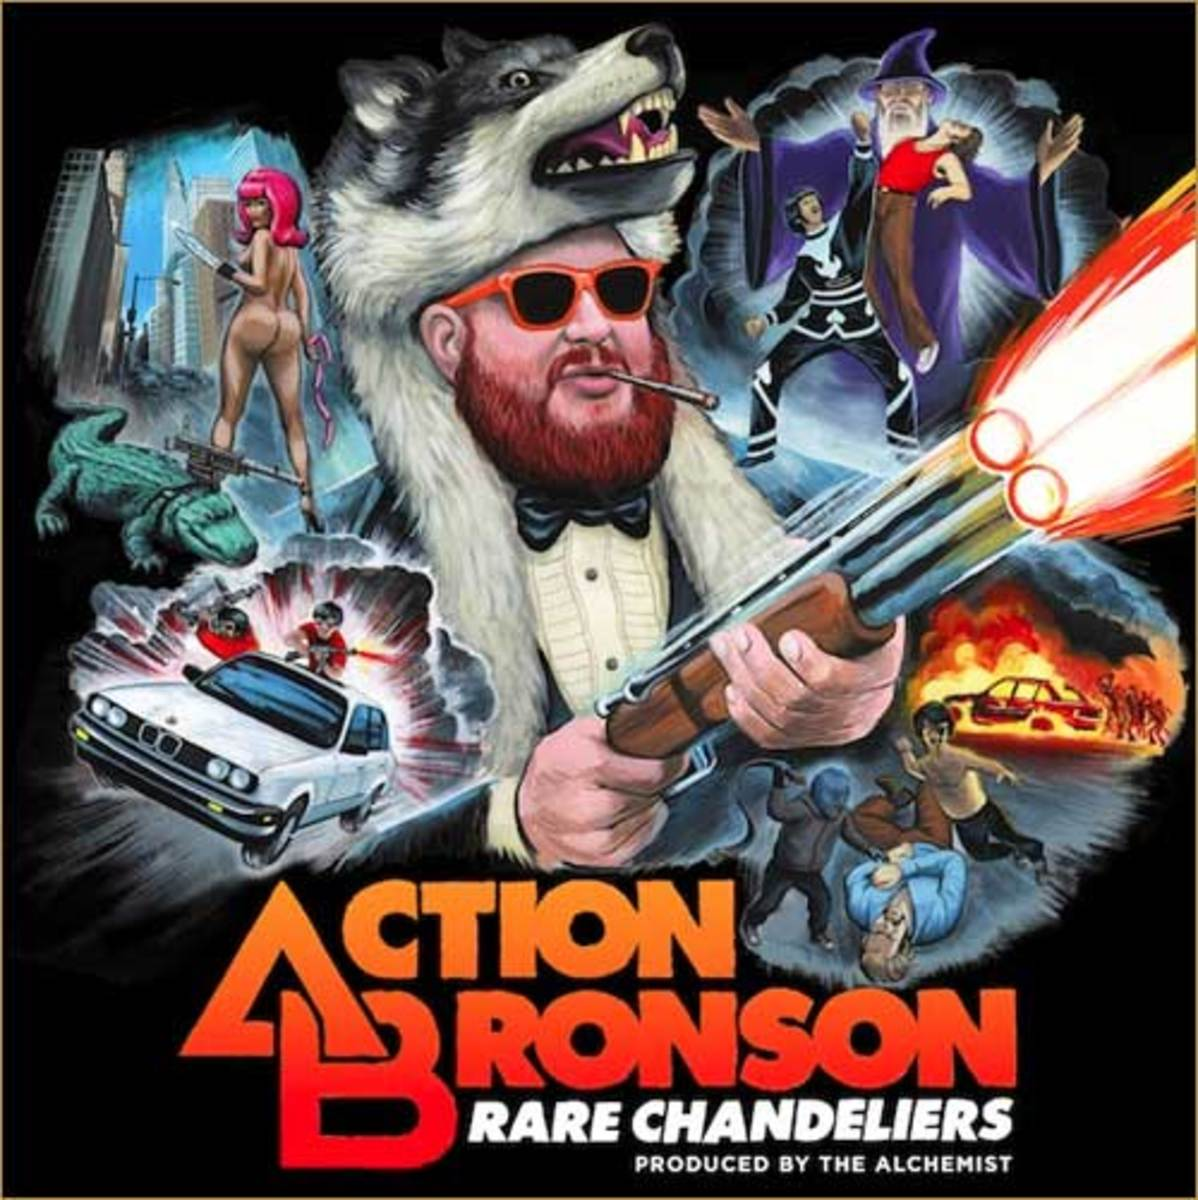 actionbronson-rare.jpg